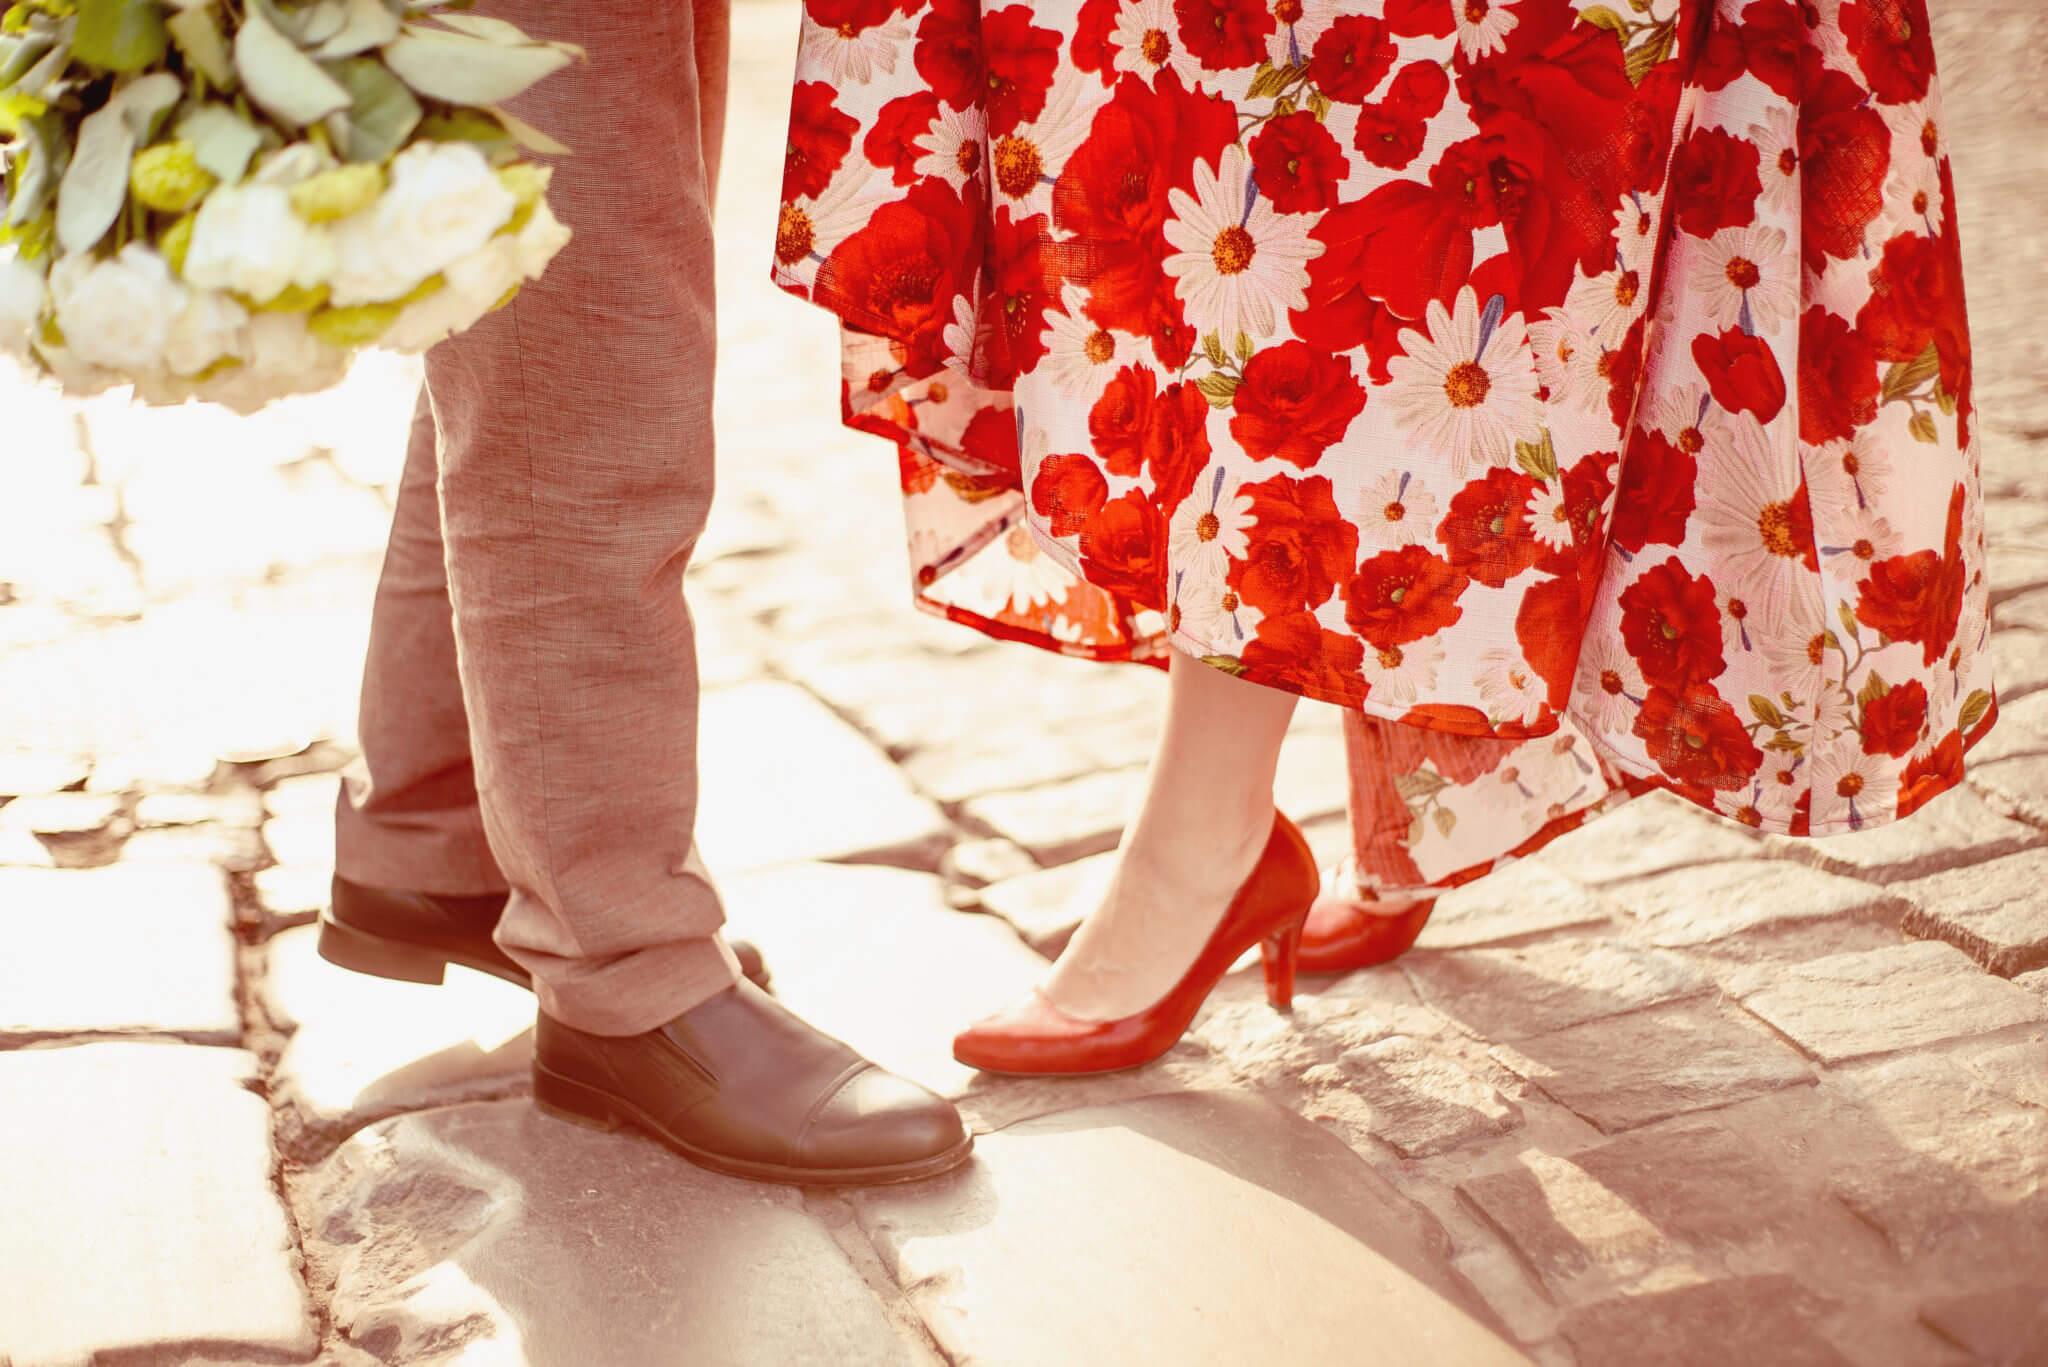 Love Story на природе, прогулка по городу, Воздвиженка, закат, в кадре мужские и женские ноги на брусчатке, ph Постникова Алиса